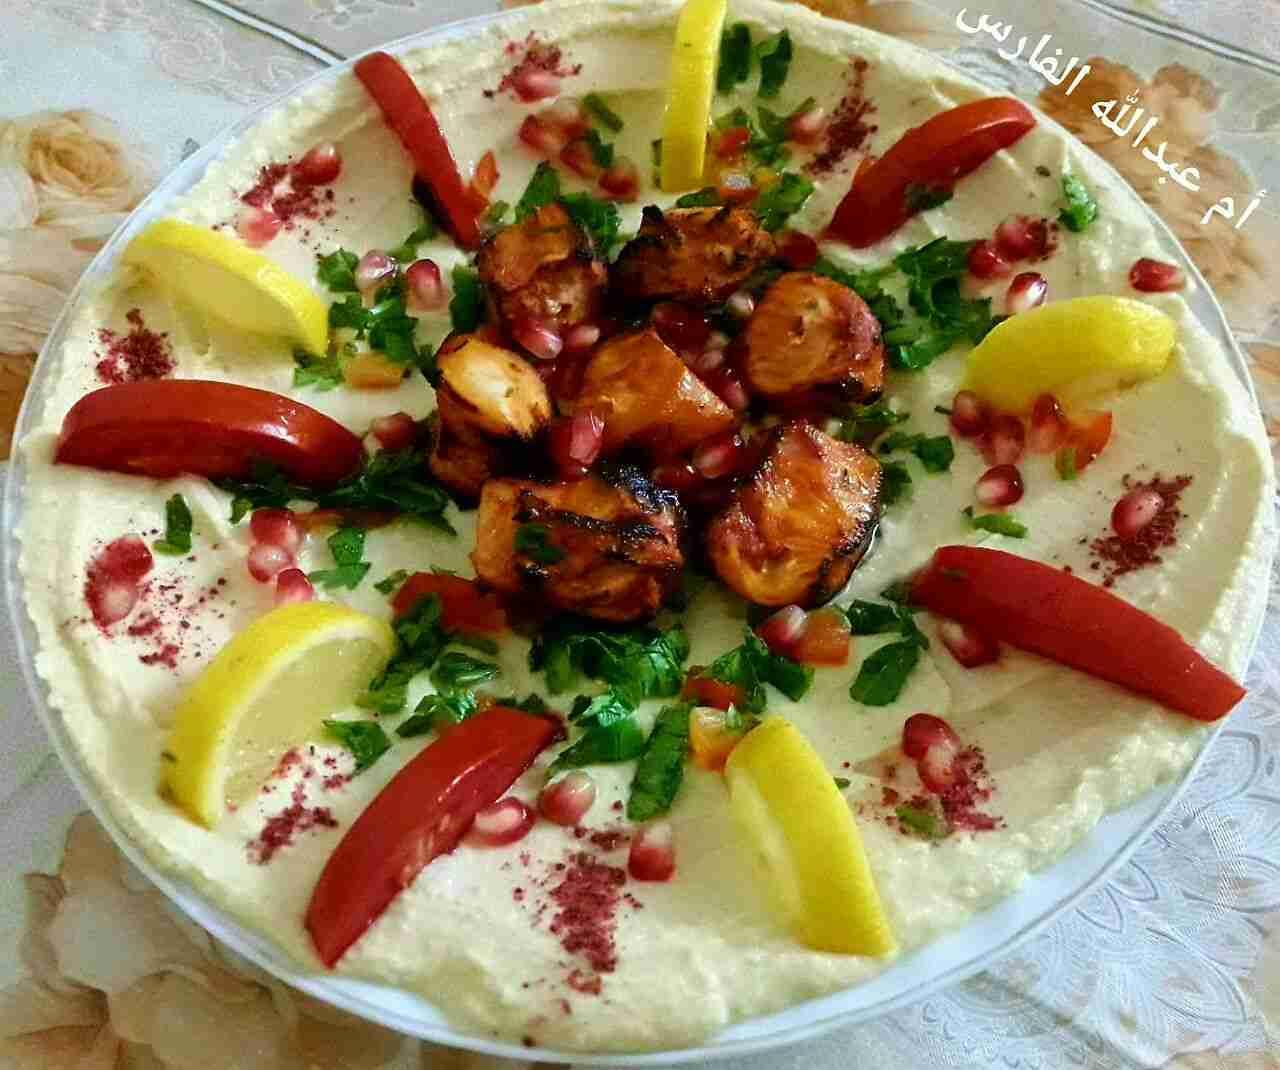 طبخات و حلويات سهله و بسيطه و طعمها رووووعه//مُرفقه مع الوصفات. إن شاء الله تعجبكم